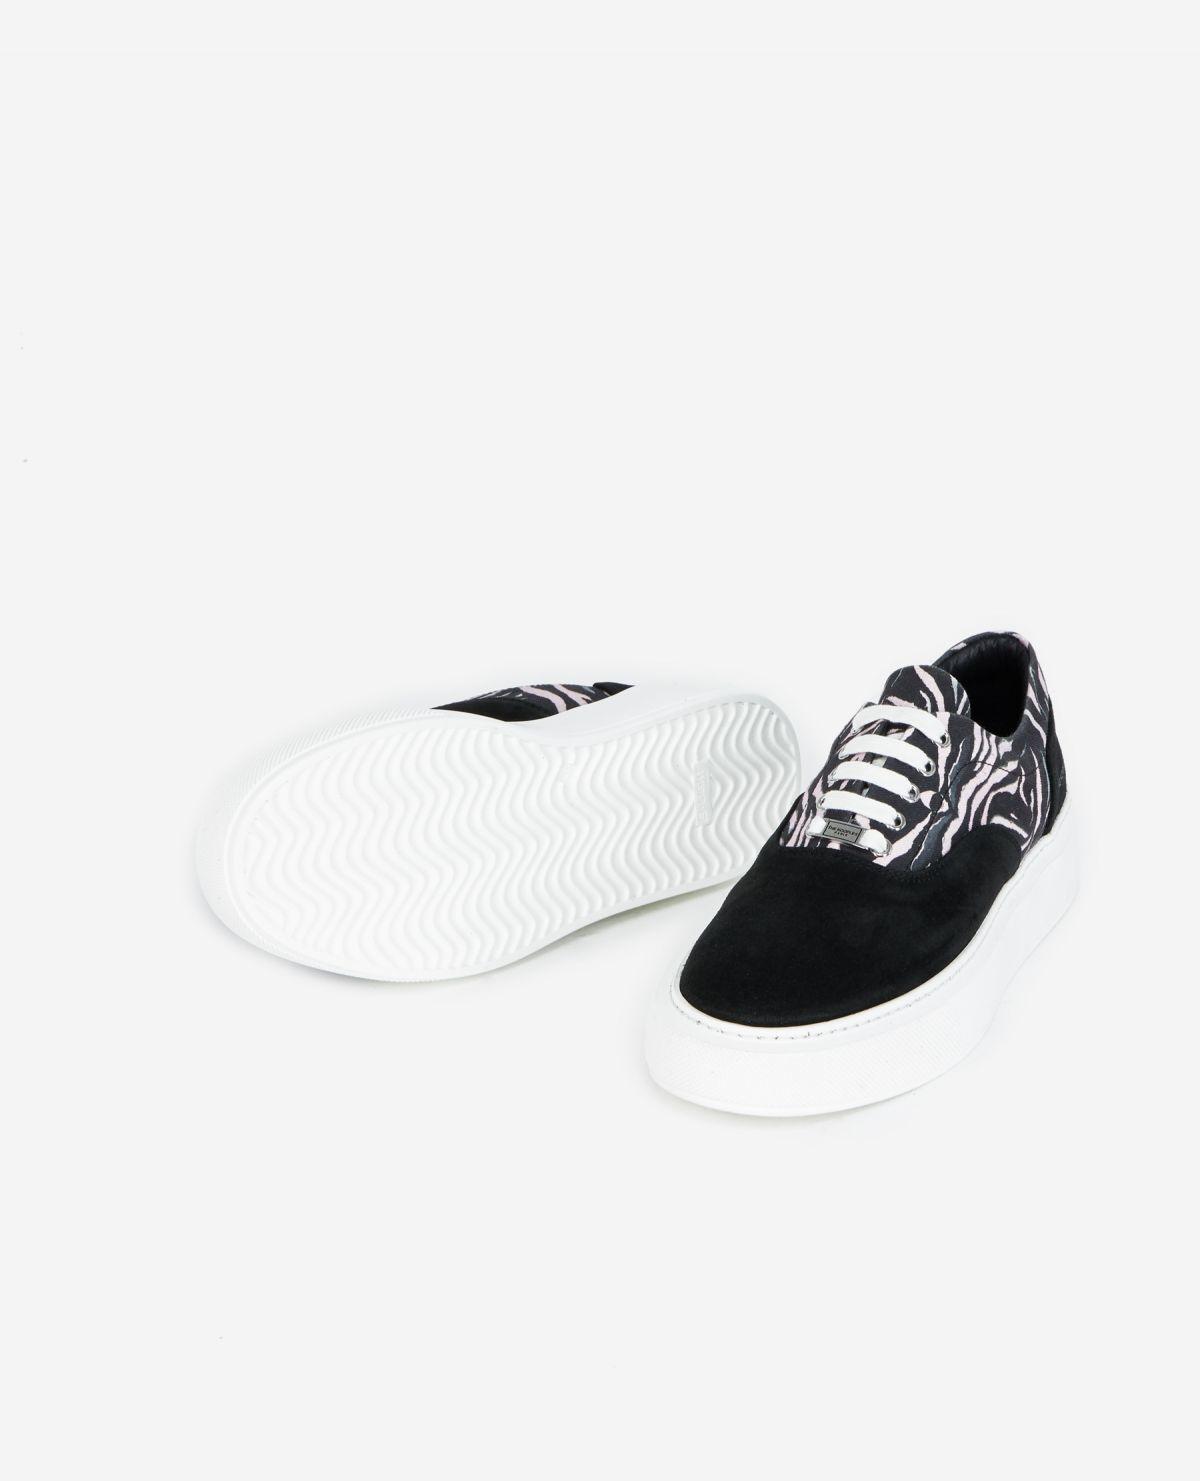 THE KOOPLES baskets cuir noir et blanches-4